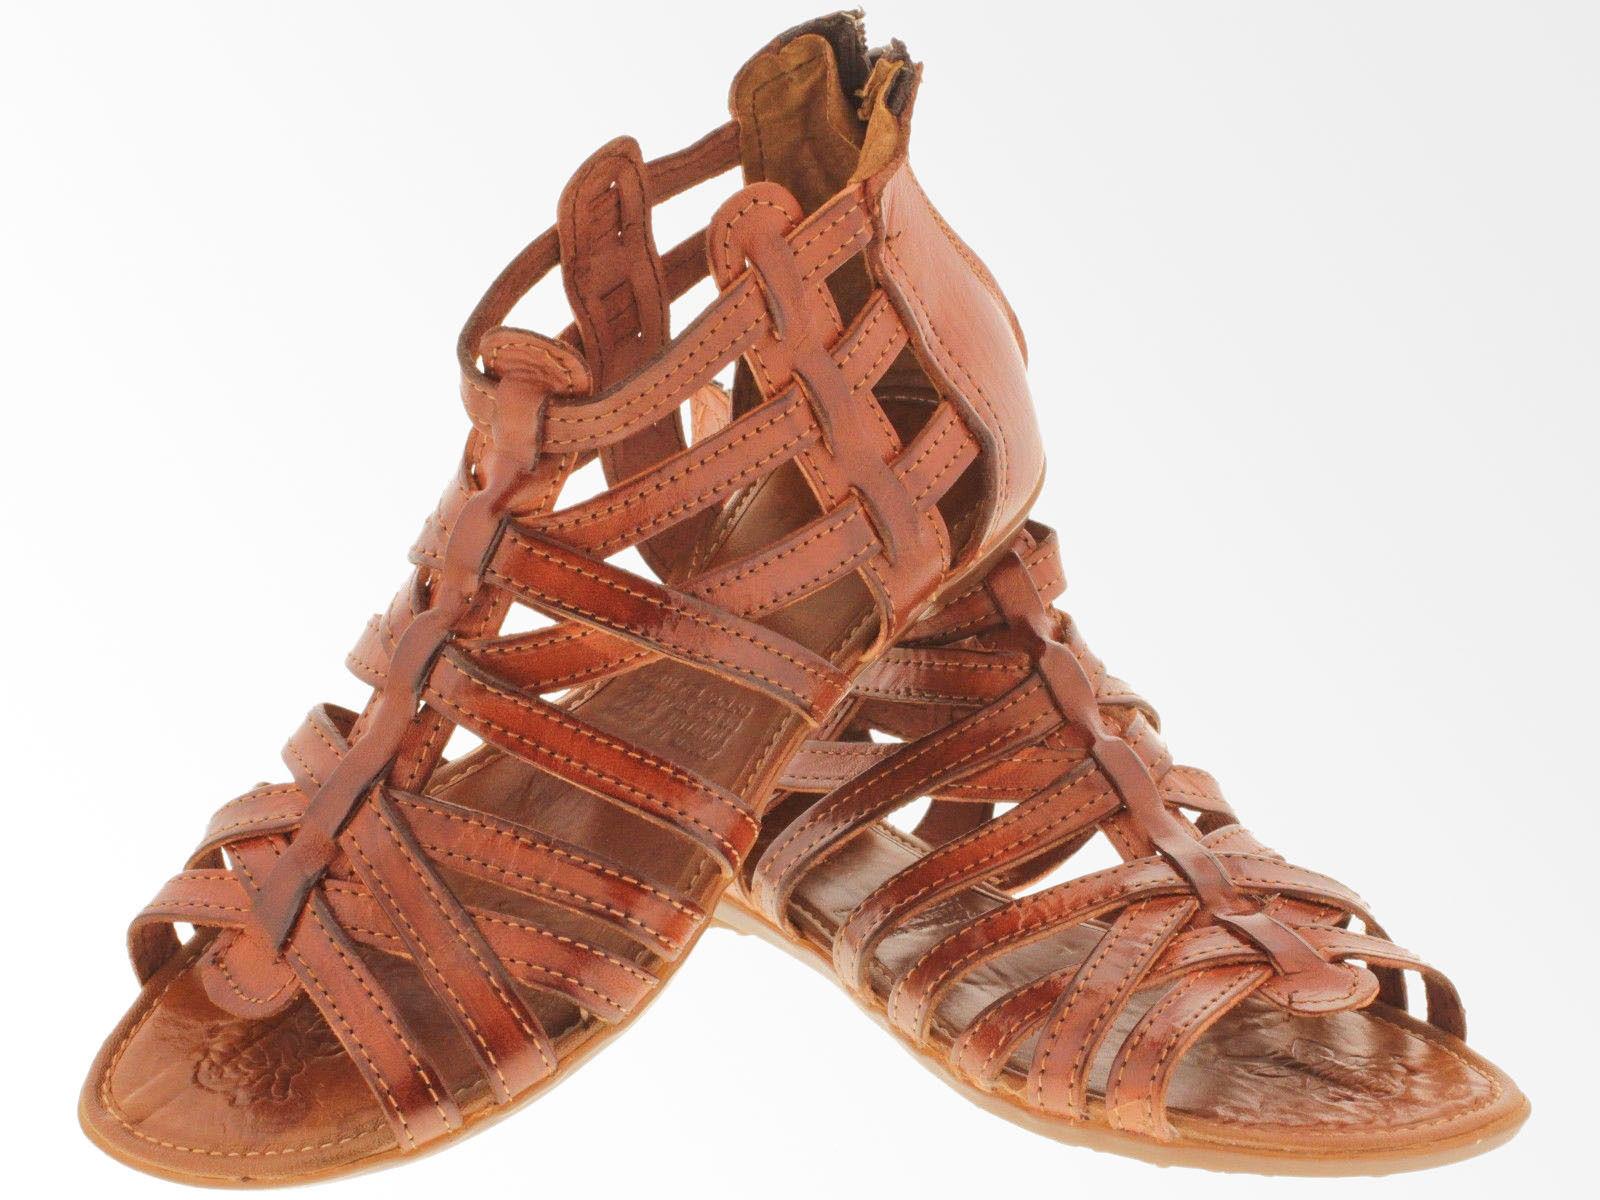 4b68c1e4be86d Womens Cognac Huaraches Boho Gladiator and 50 similar items. S l1600